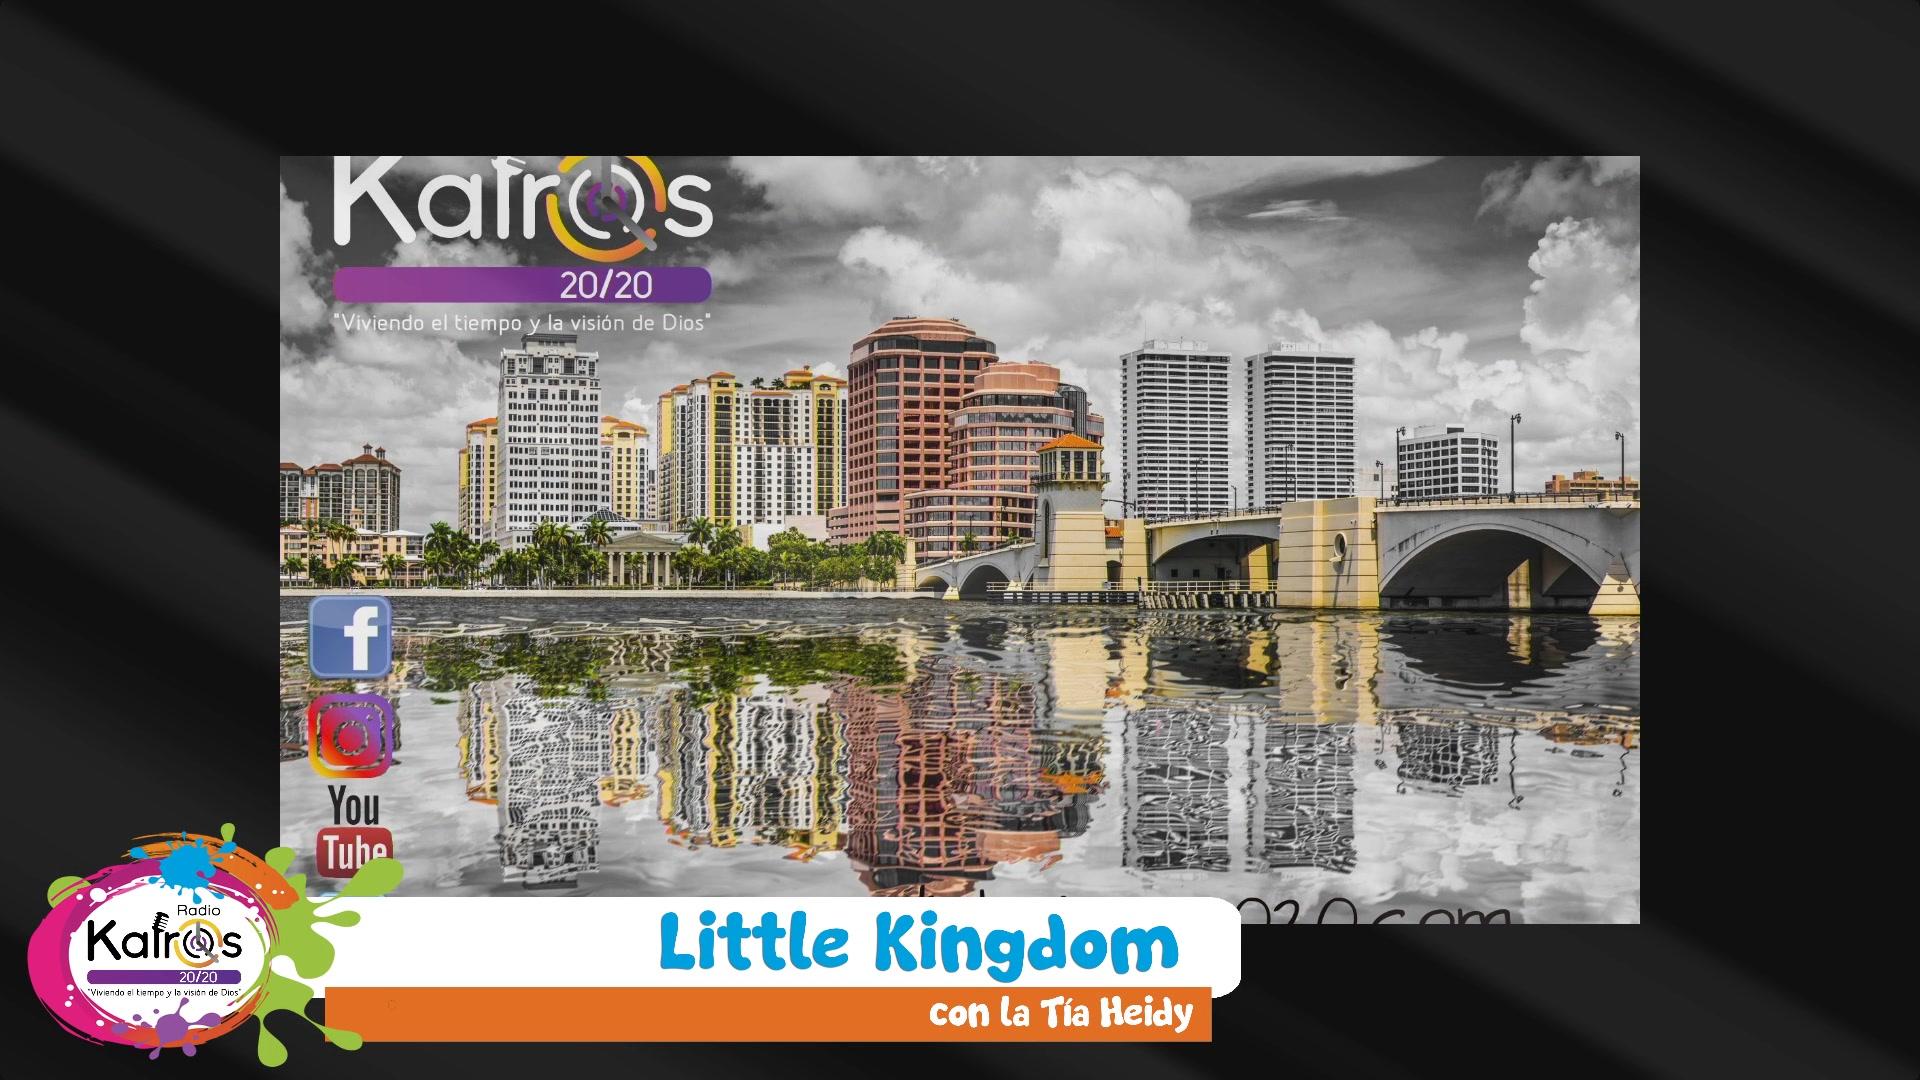 Little Kingdom con la Tia Heidy